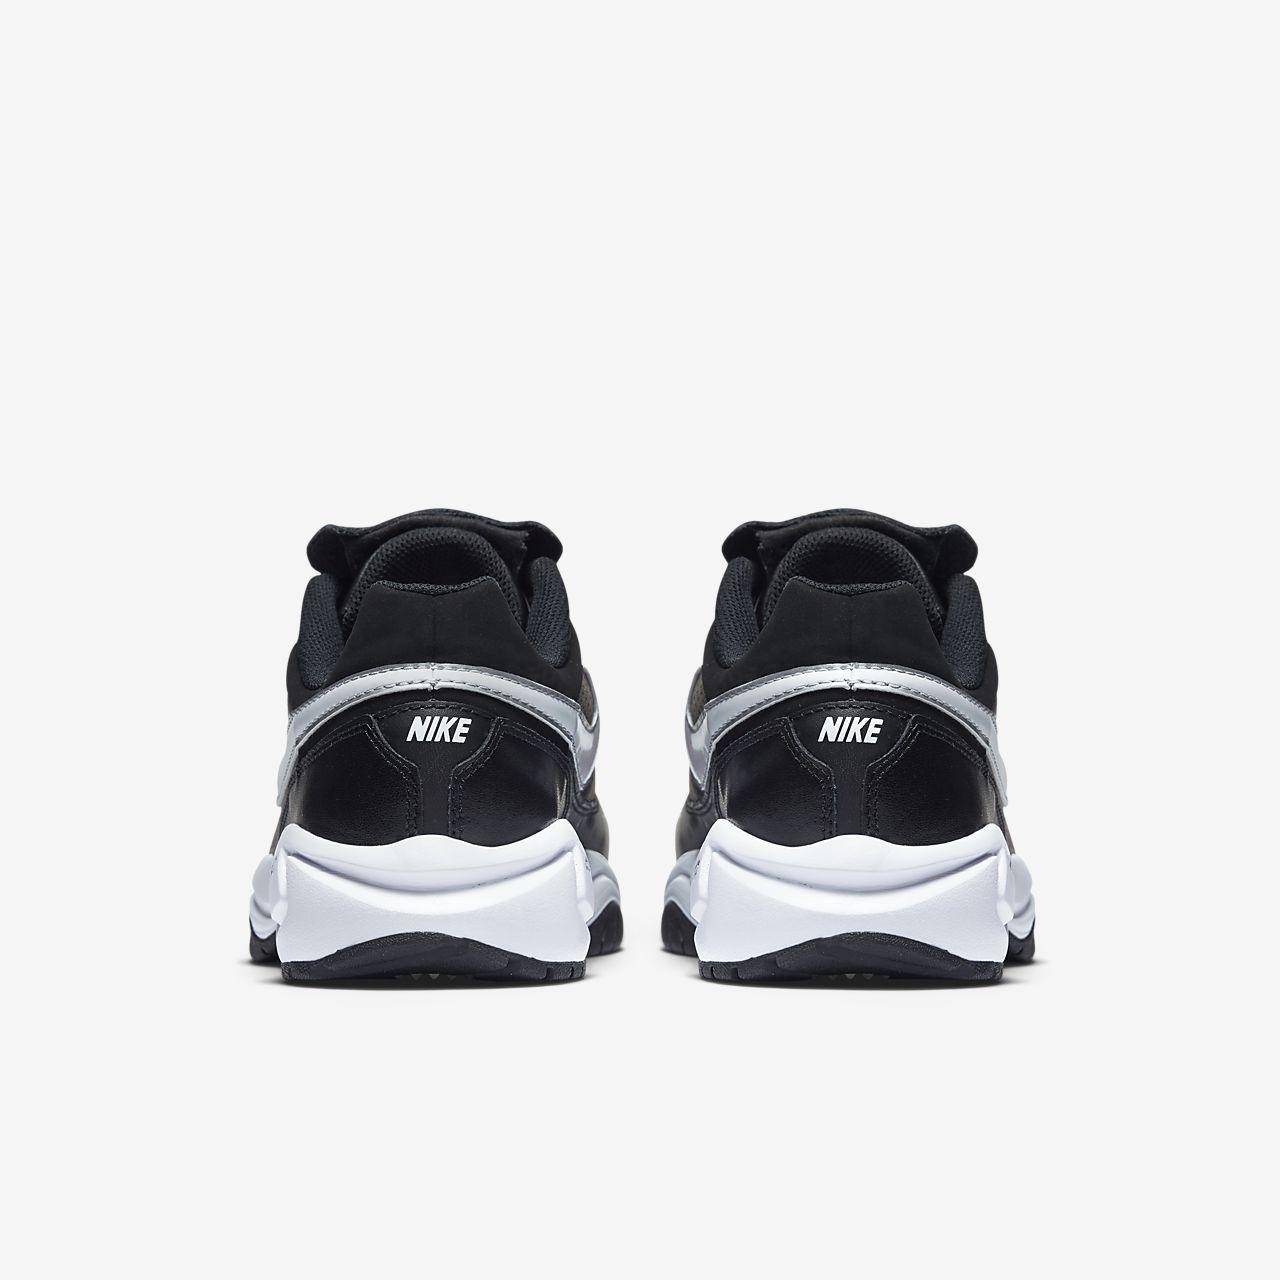 mens white nike trainers nike footwear